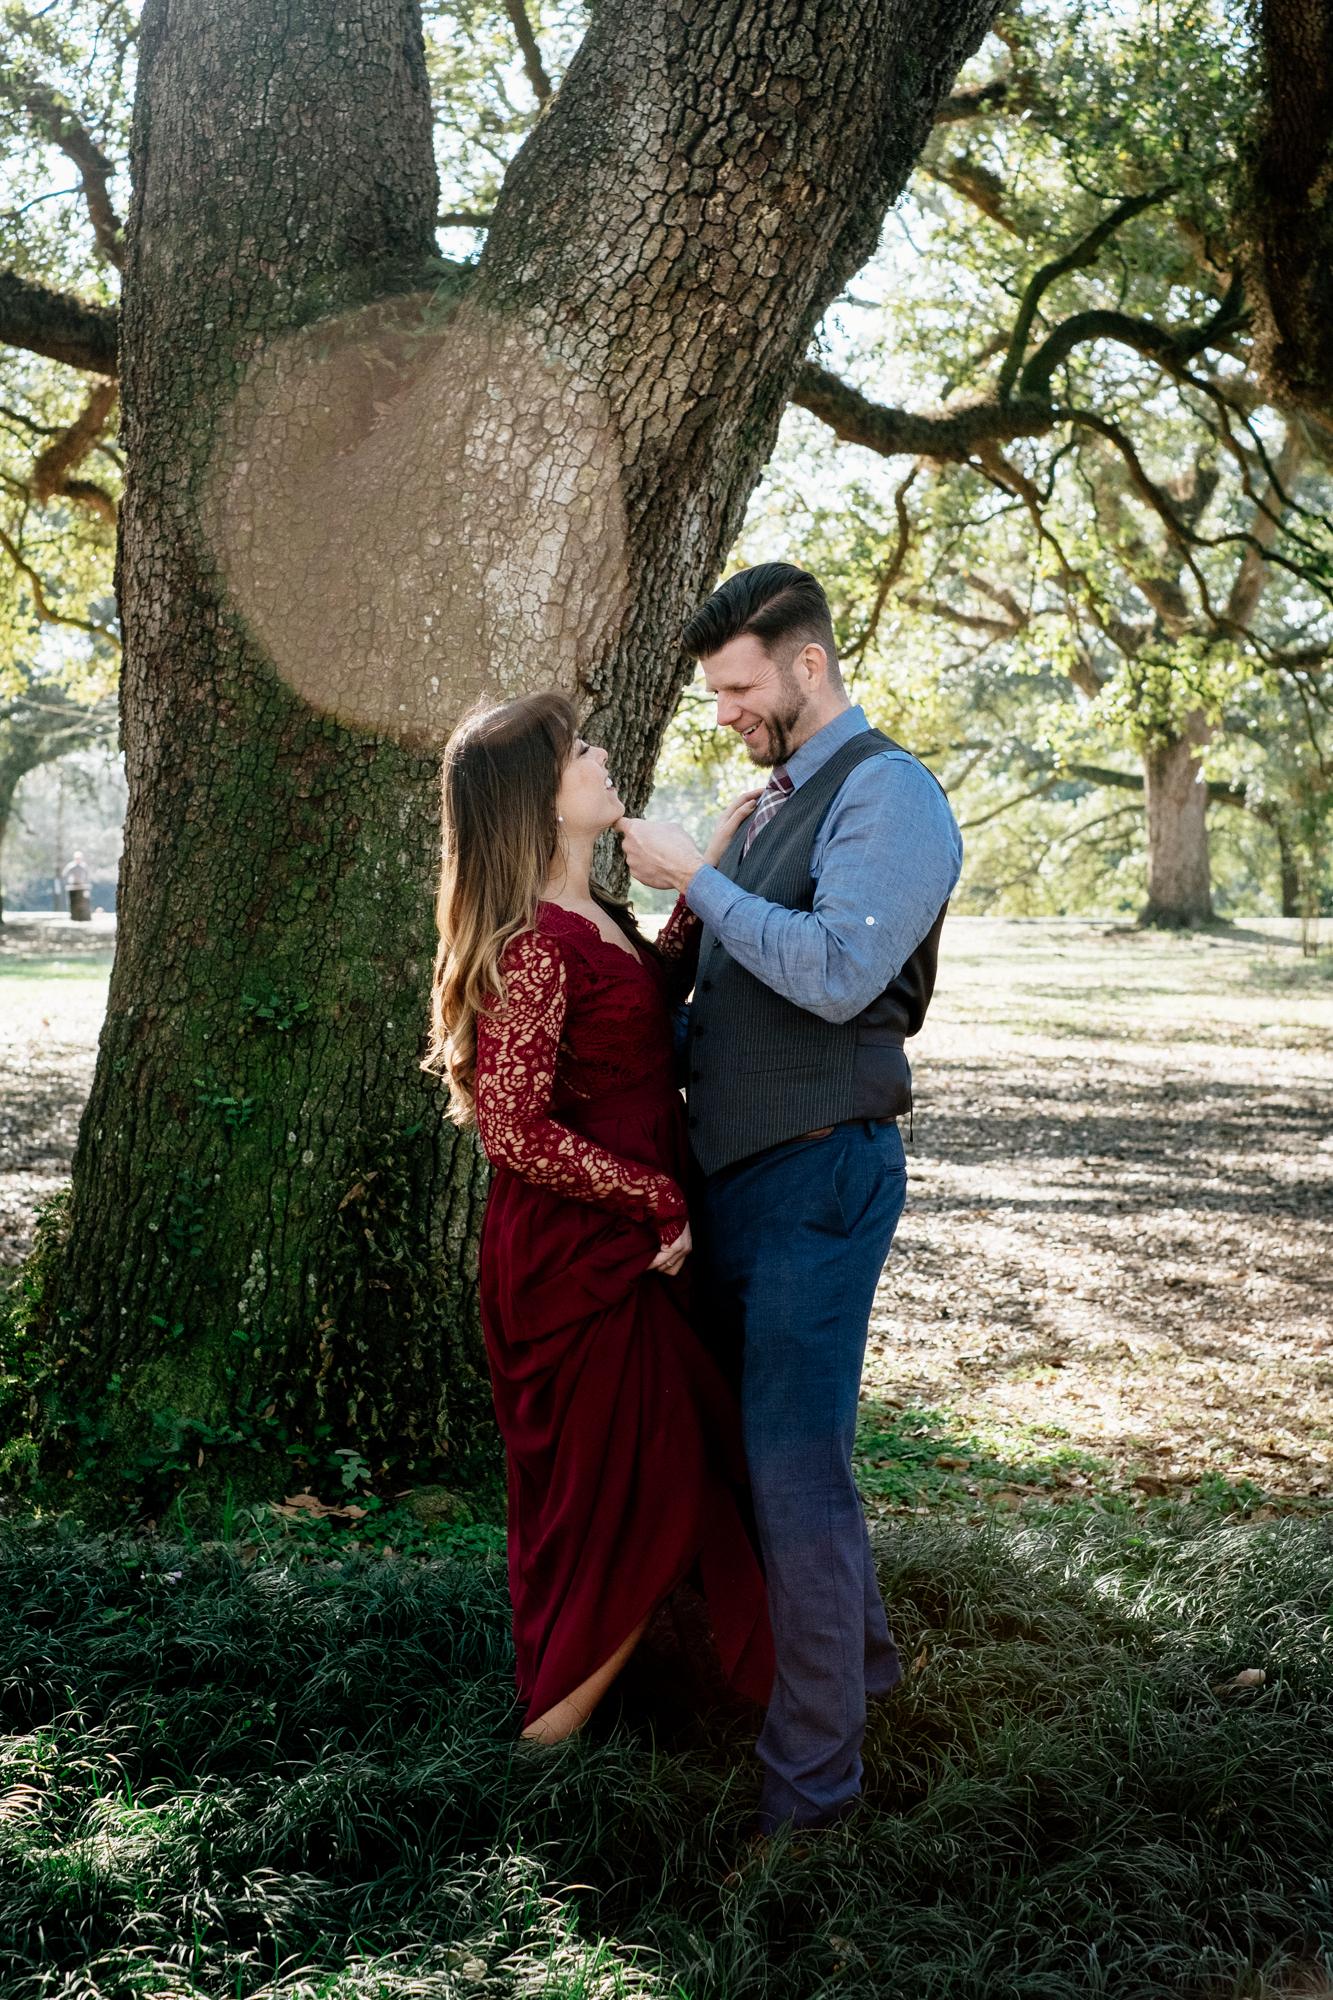 Jen_Montgomery_Photography_Angela_Brian_Engagement_Proposal_FB-215.jpg